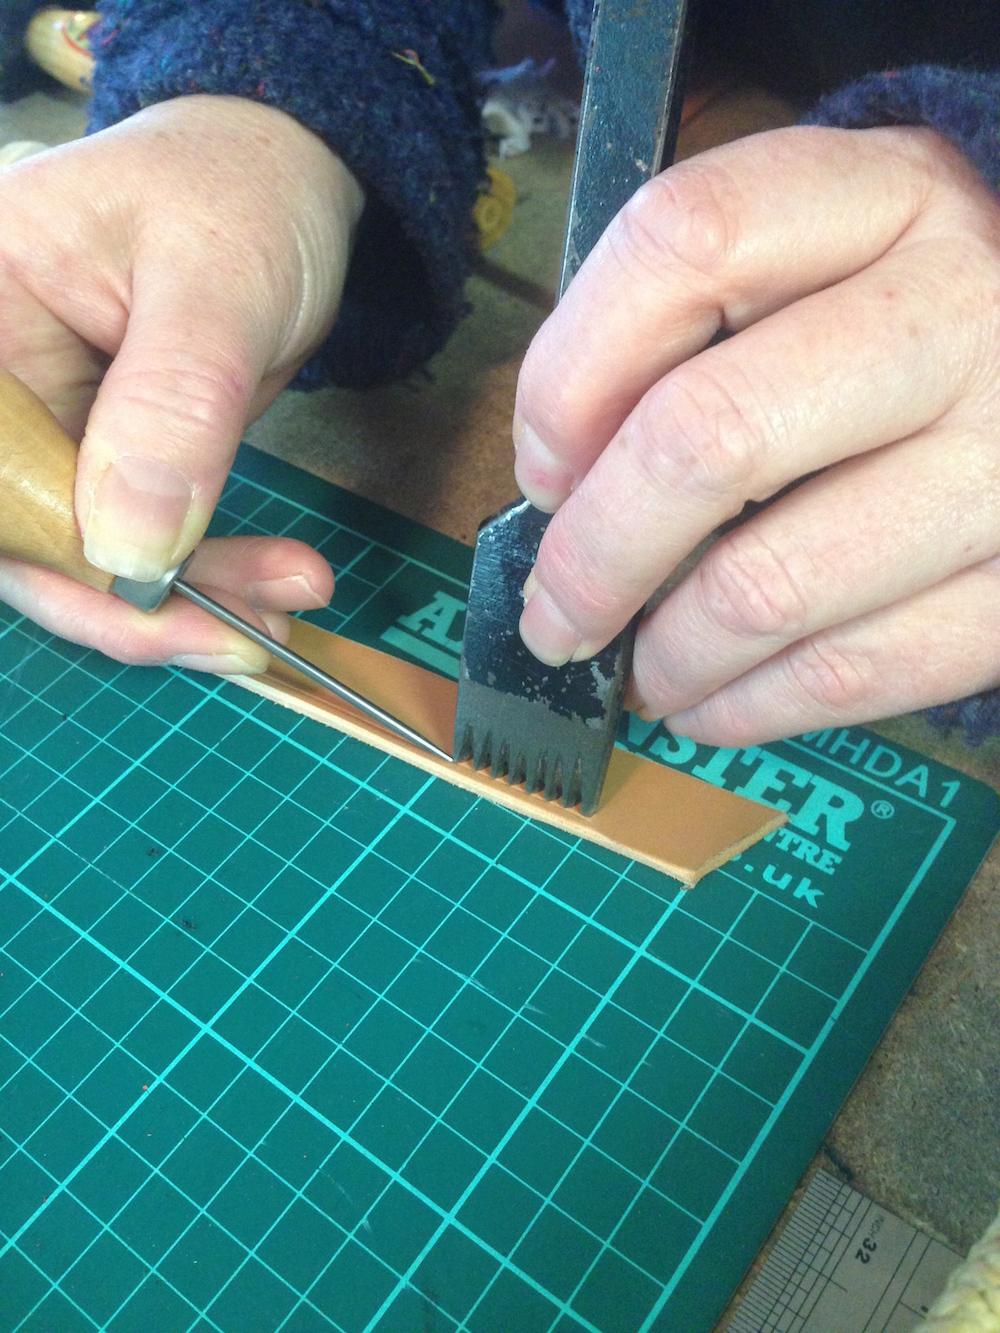 2. Preparing to hand stitch the leather.jpg